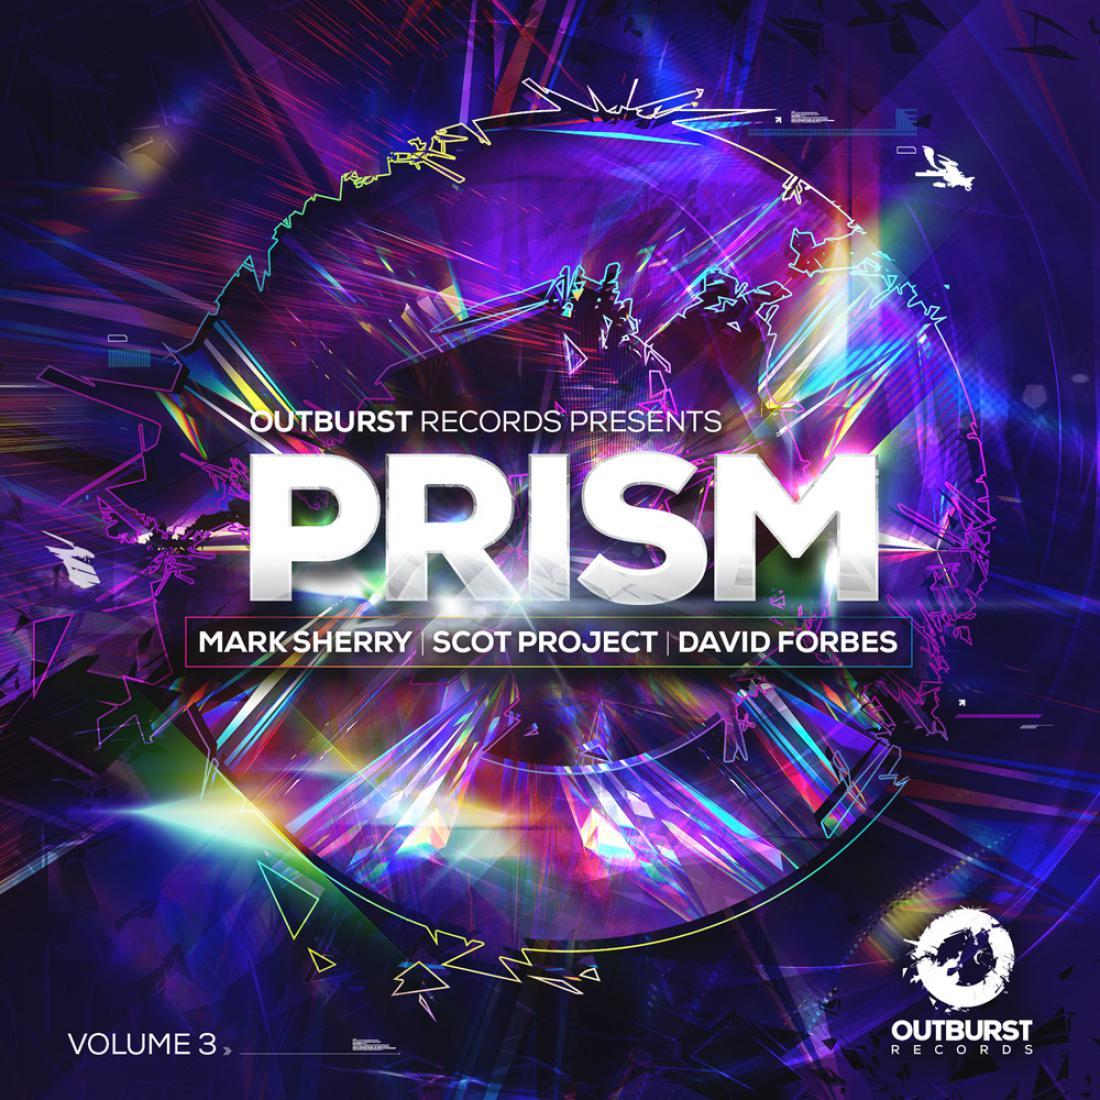 Album : Outburst presents Prism Volume 3